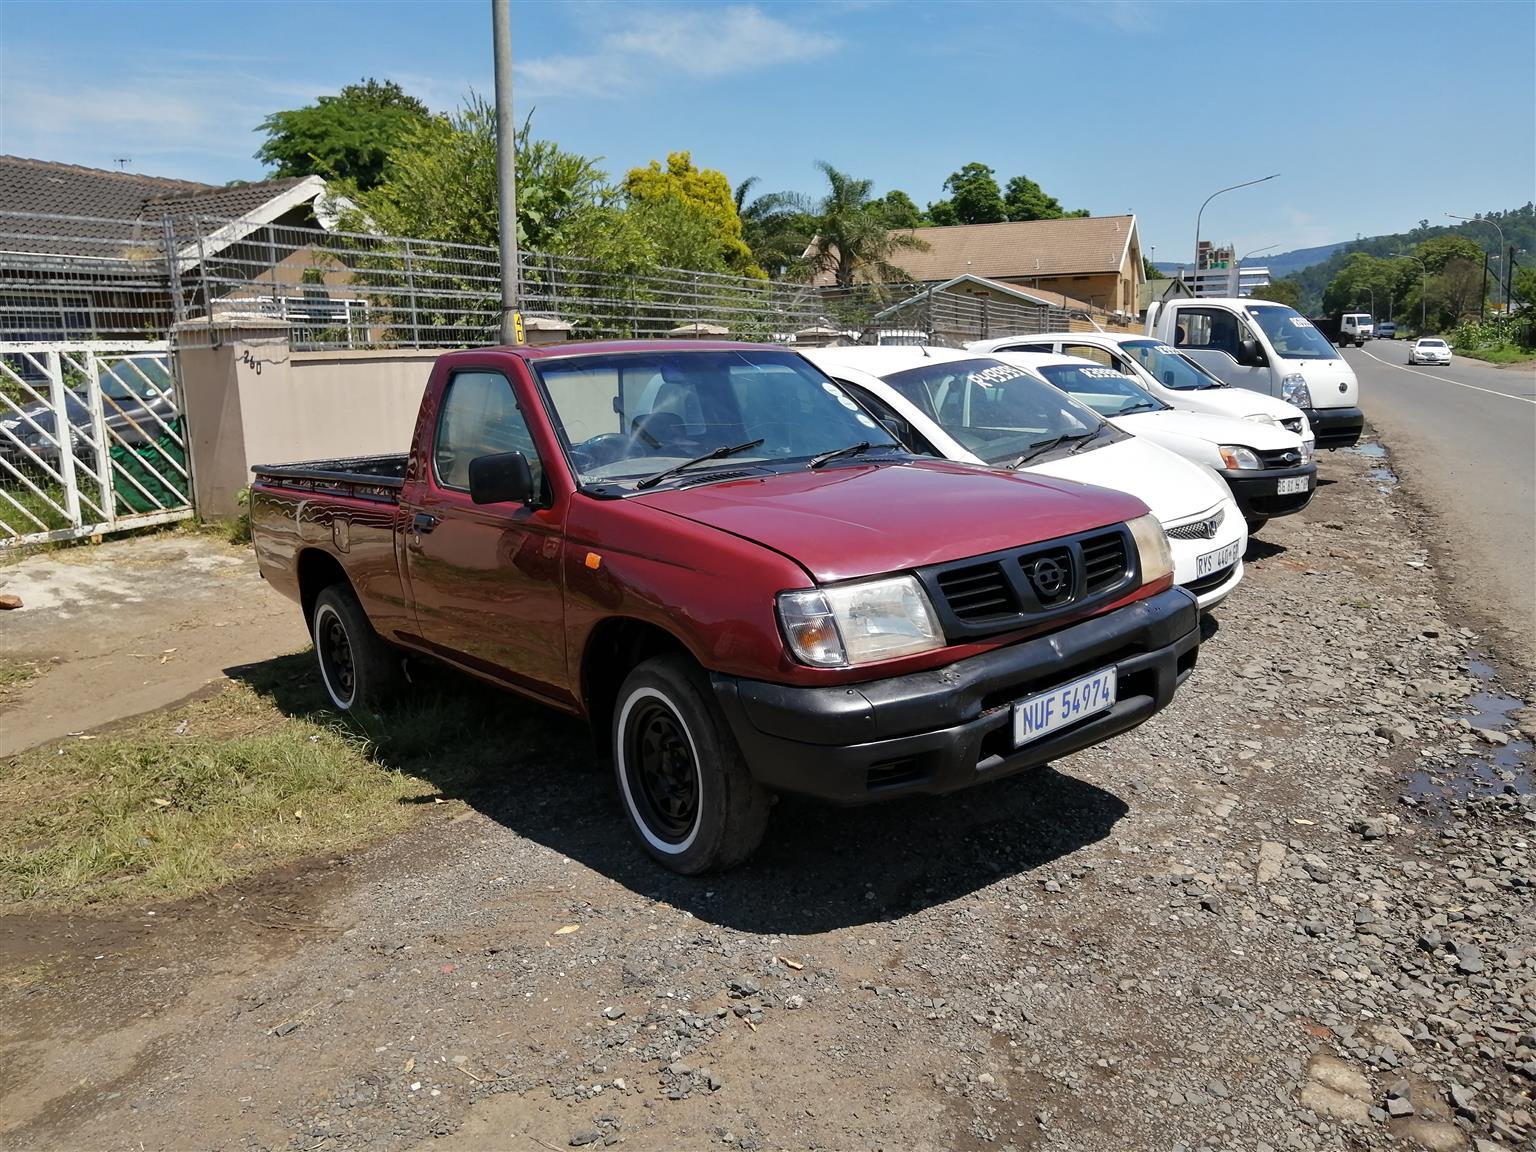 2004 Nissan Hardbody 2.0 16V LWB power steer